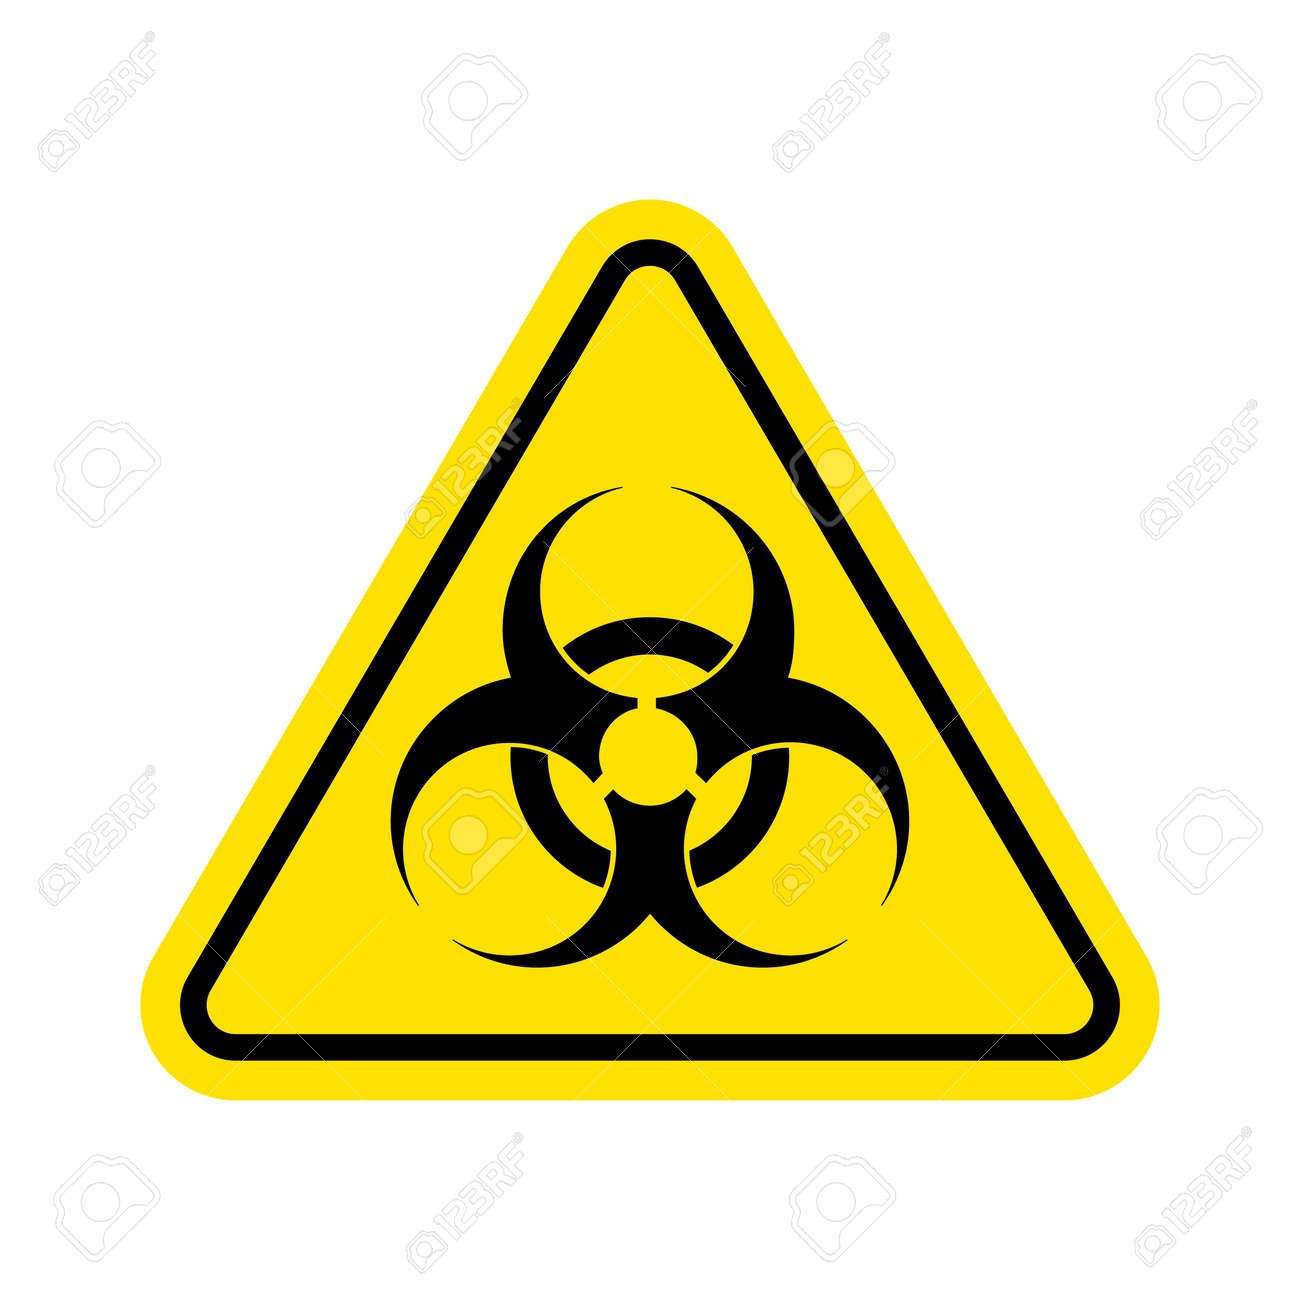 Warning sign of virus biohazard icon biohazard symbol isolated warning sign of virus biohazard icon biohazard symbol isolated on white background biocorpaavc Images